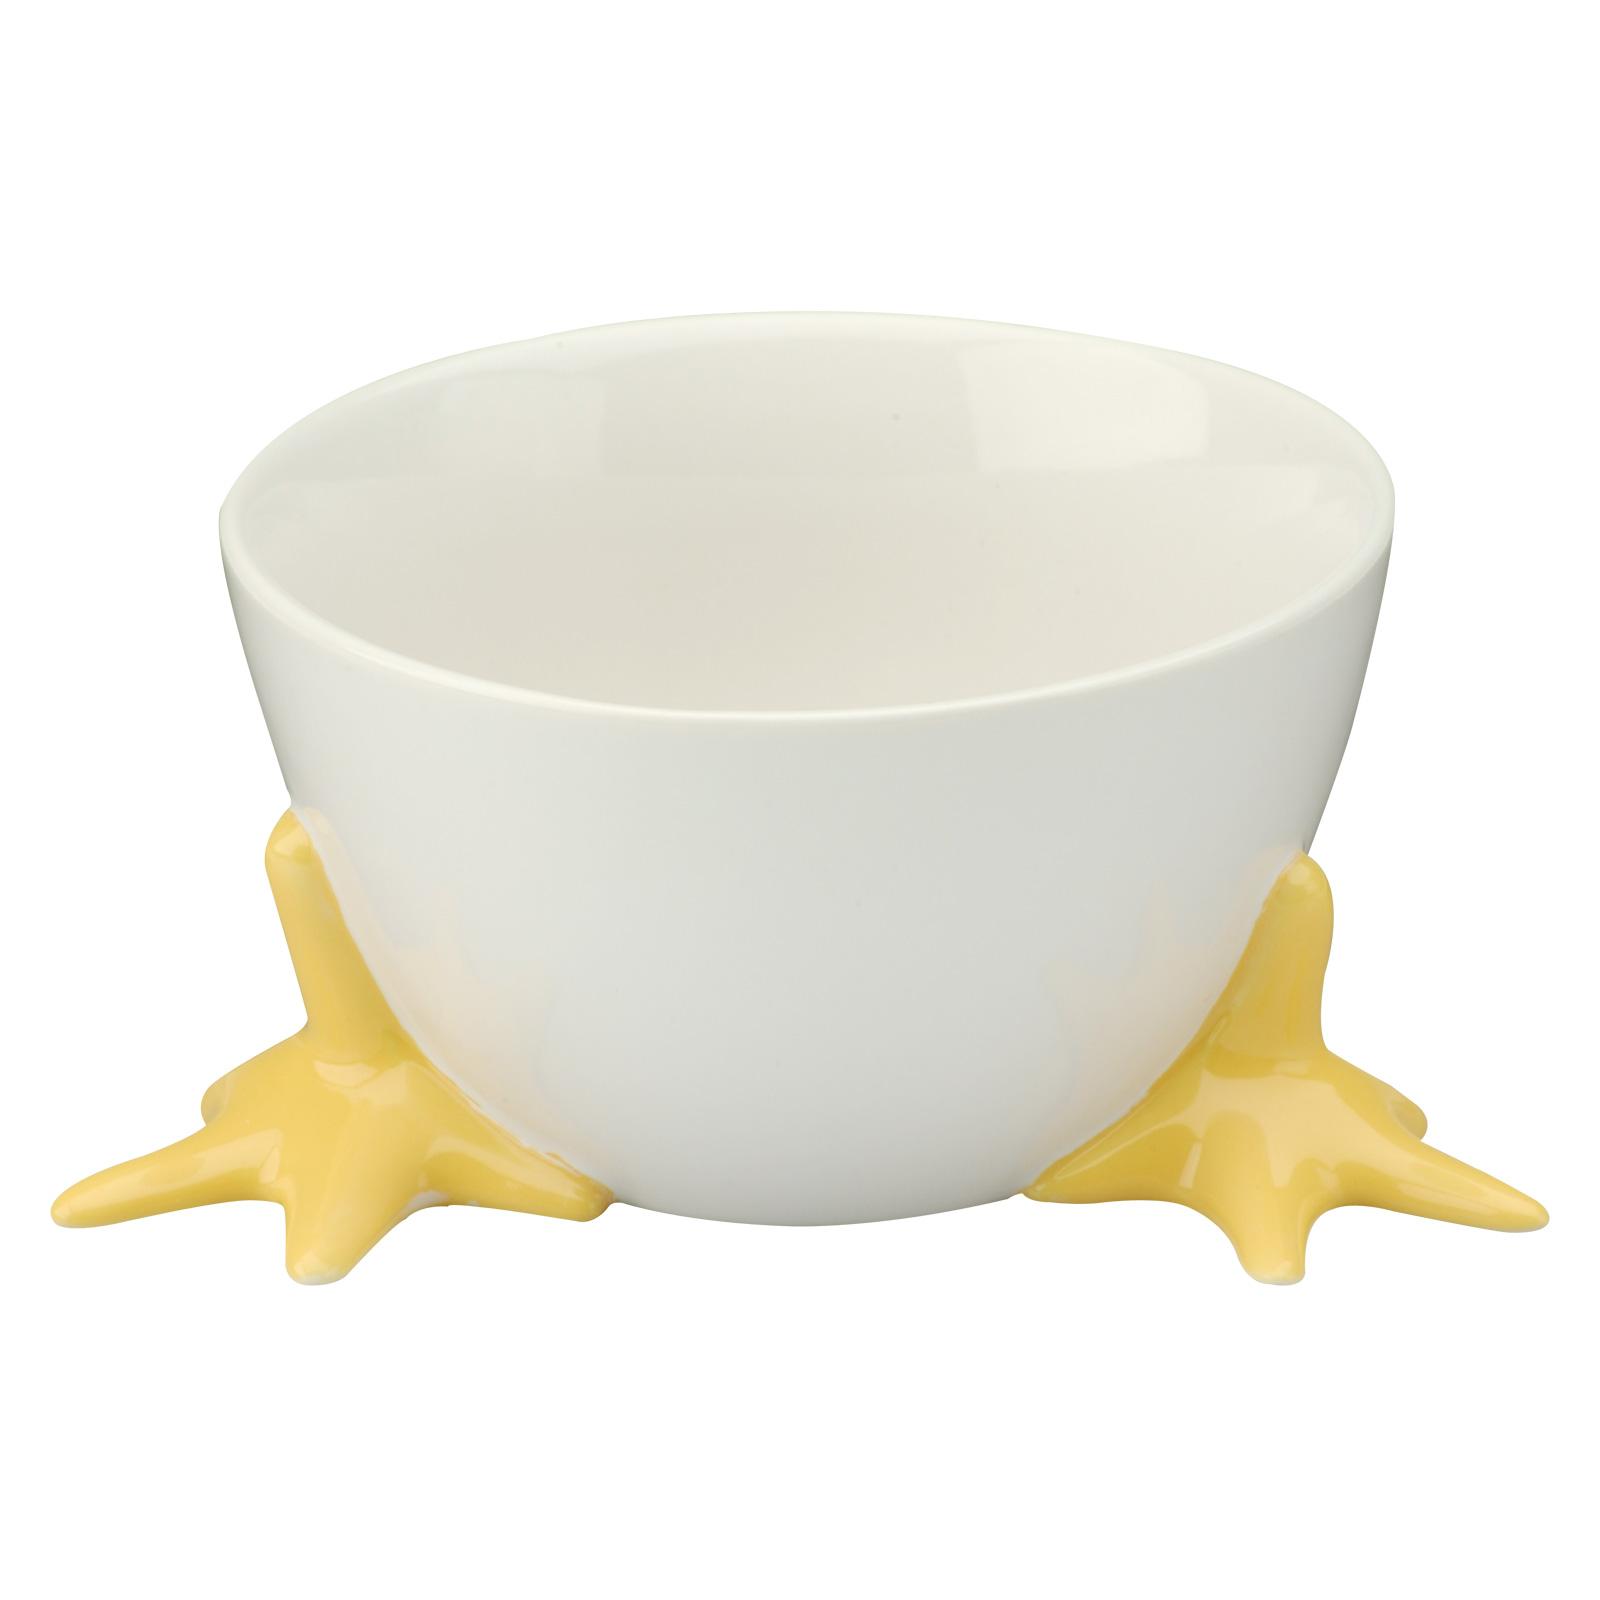 Cordon Bleu White Porcelain Egg Cups With Yellow En Feet Set Of 4 Bia 404150g